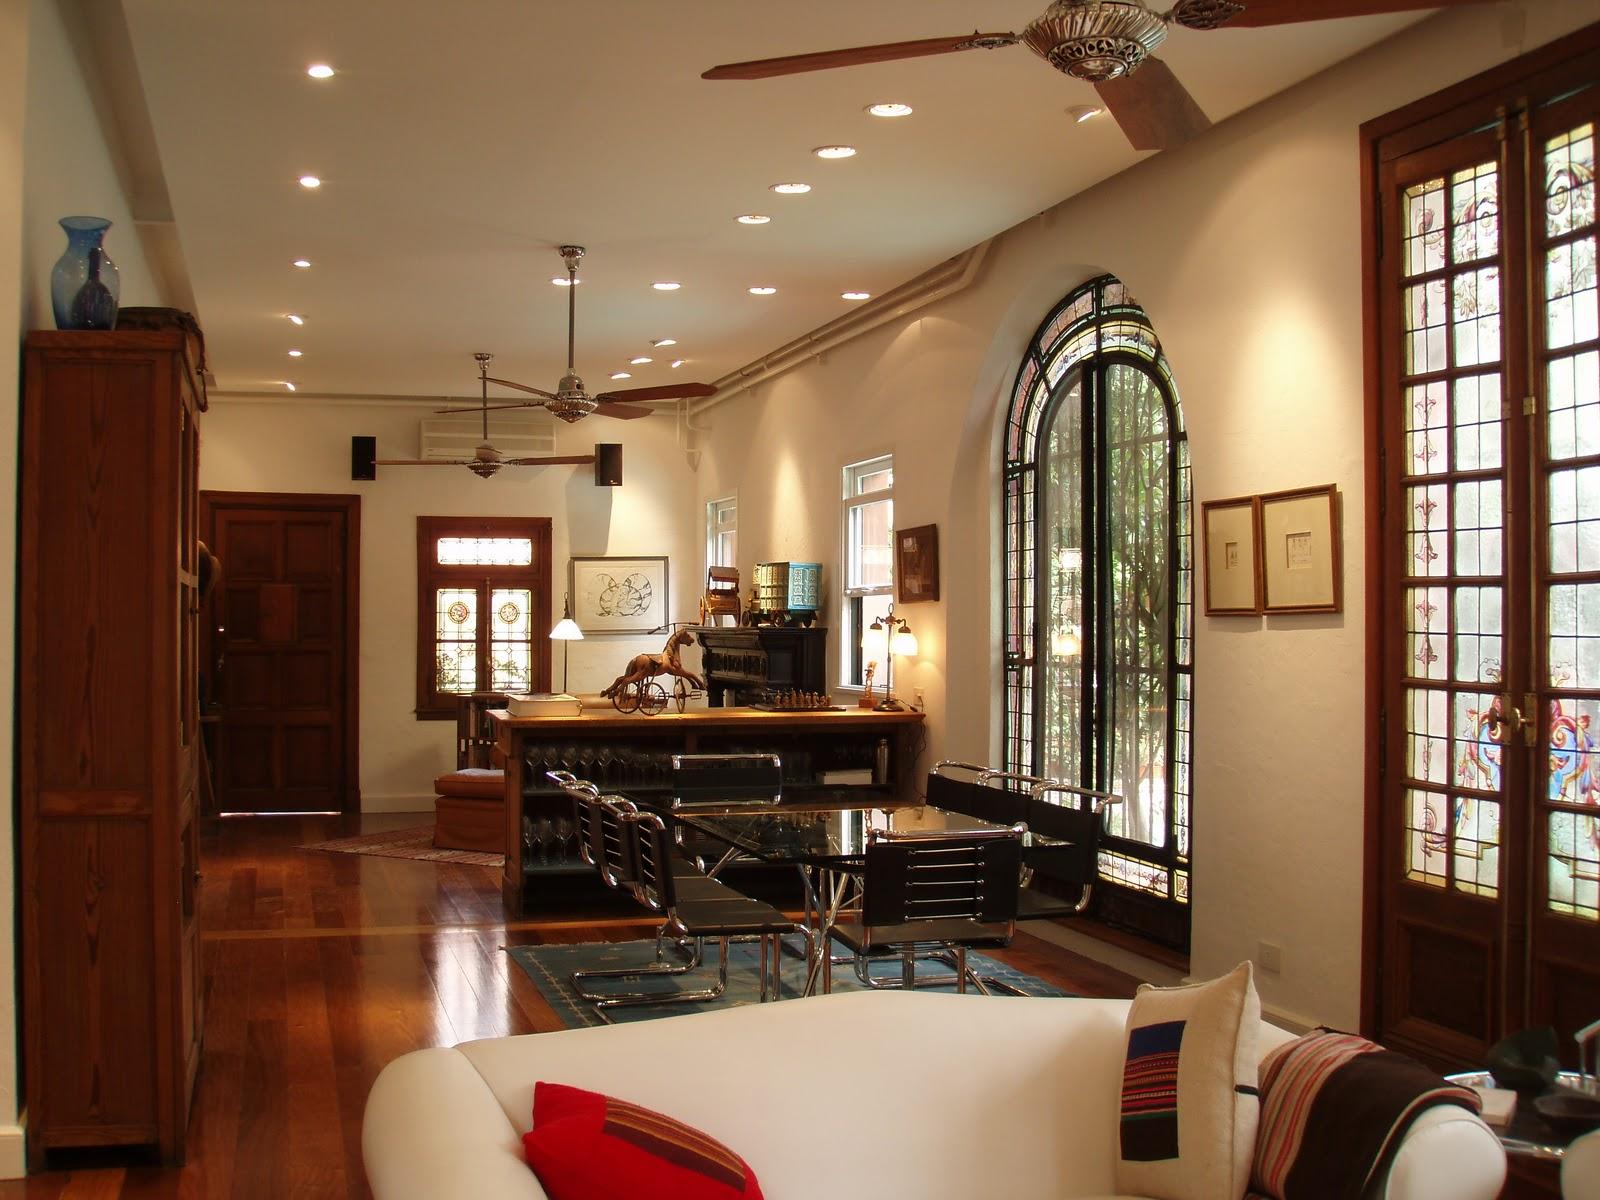 Iluminacion e p s i iluminacion de interiores for Decoracion de iluminacion interior